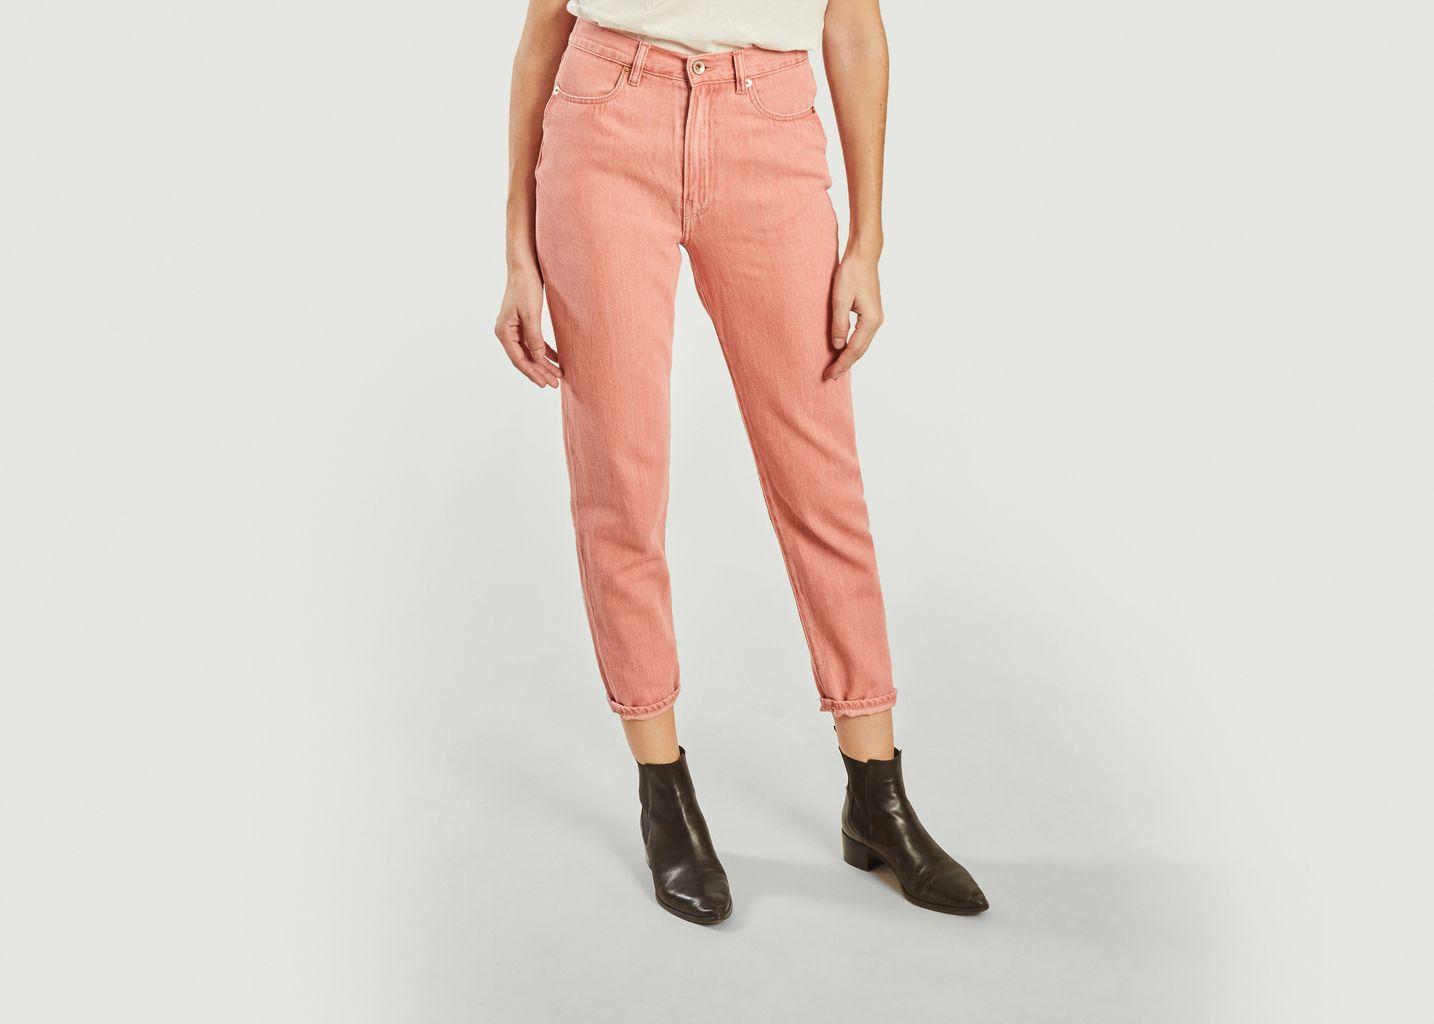 Pantalon Perkins - Bellerose